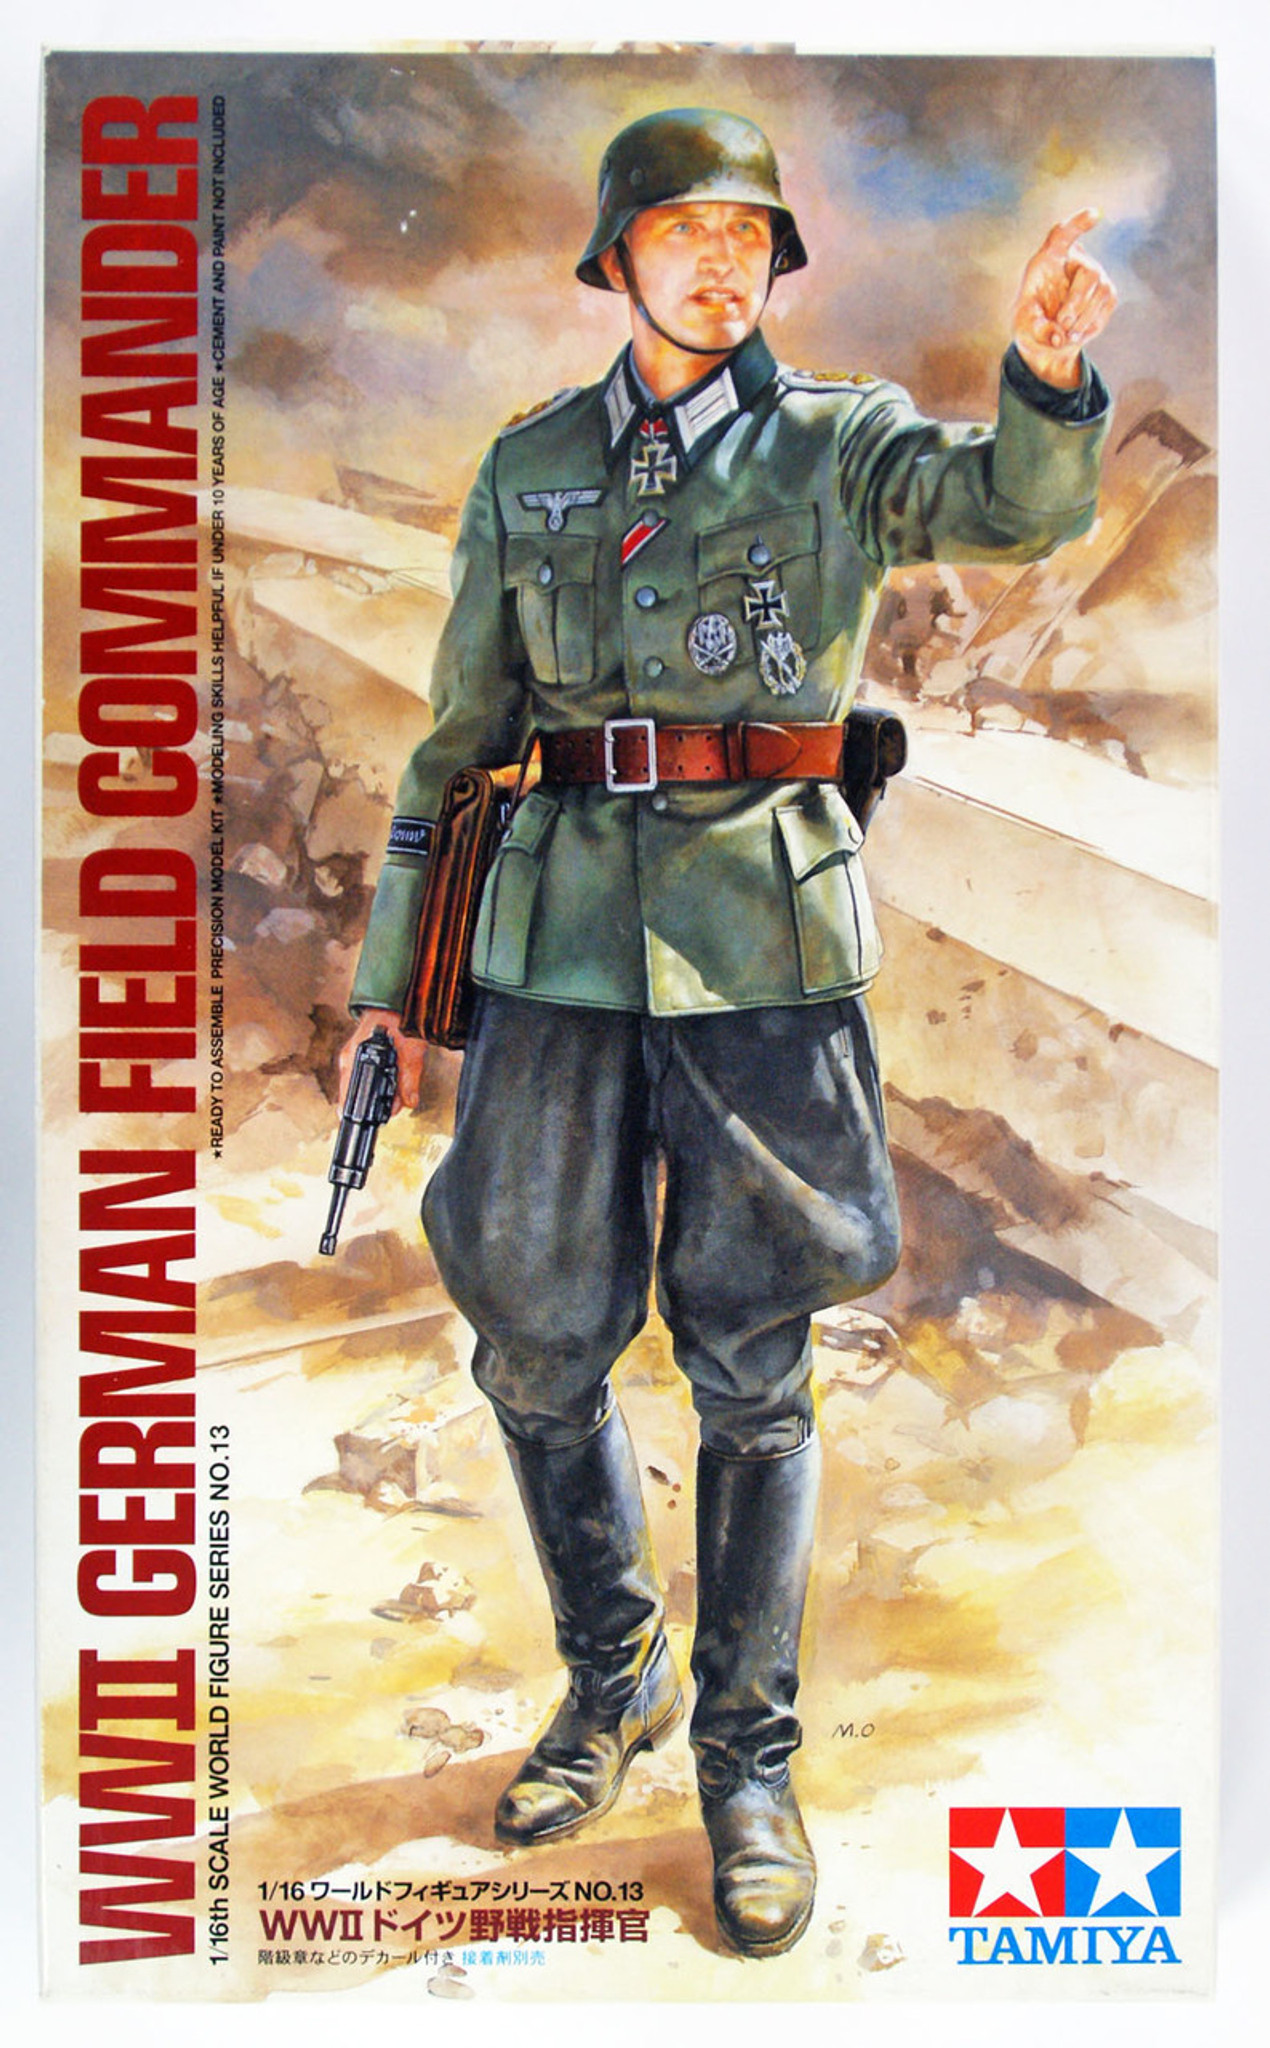 Tamiya Military Model 1//16 German Feldmarschall ROMMEL Figure Scale Hobby 36305